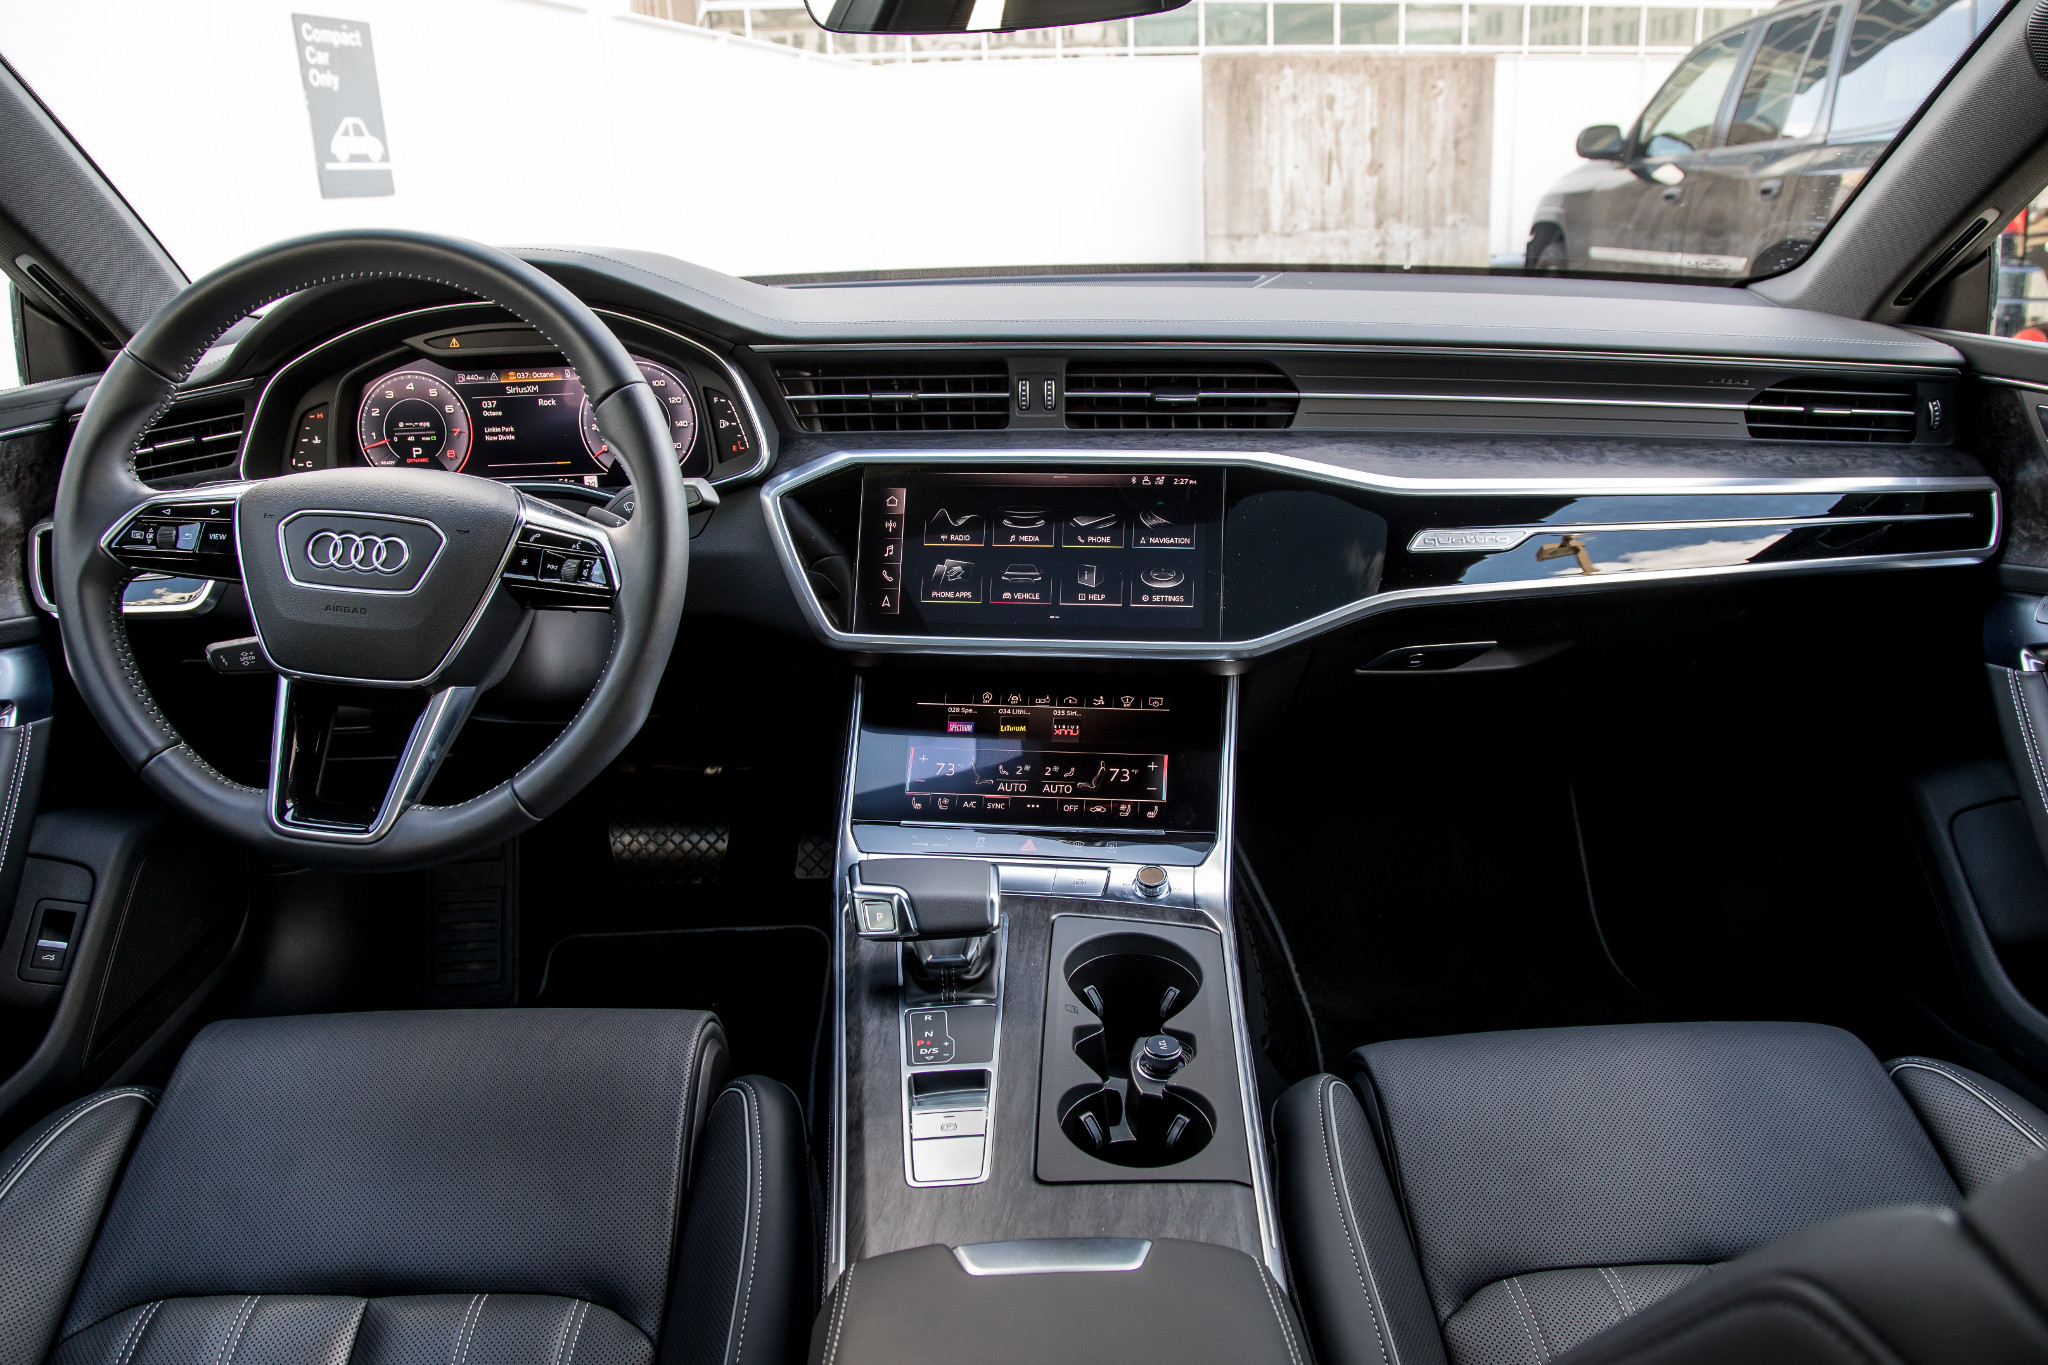 16-audi-a7-2019-cockpit-shot--front-row--interior.jpg